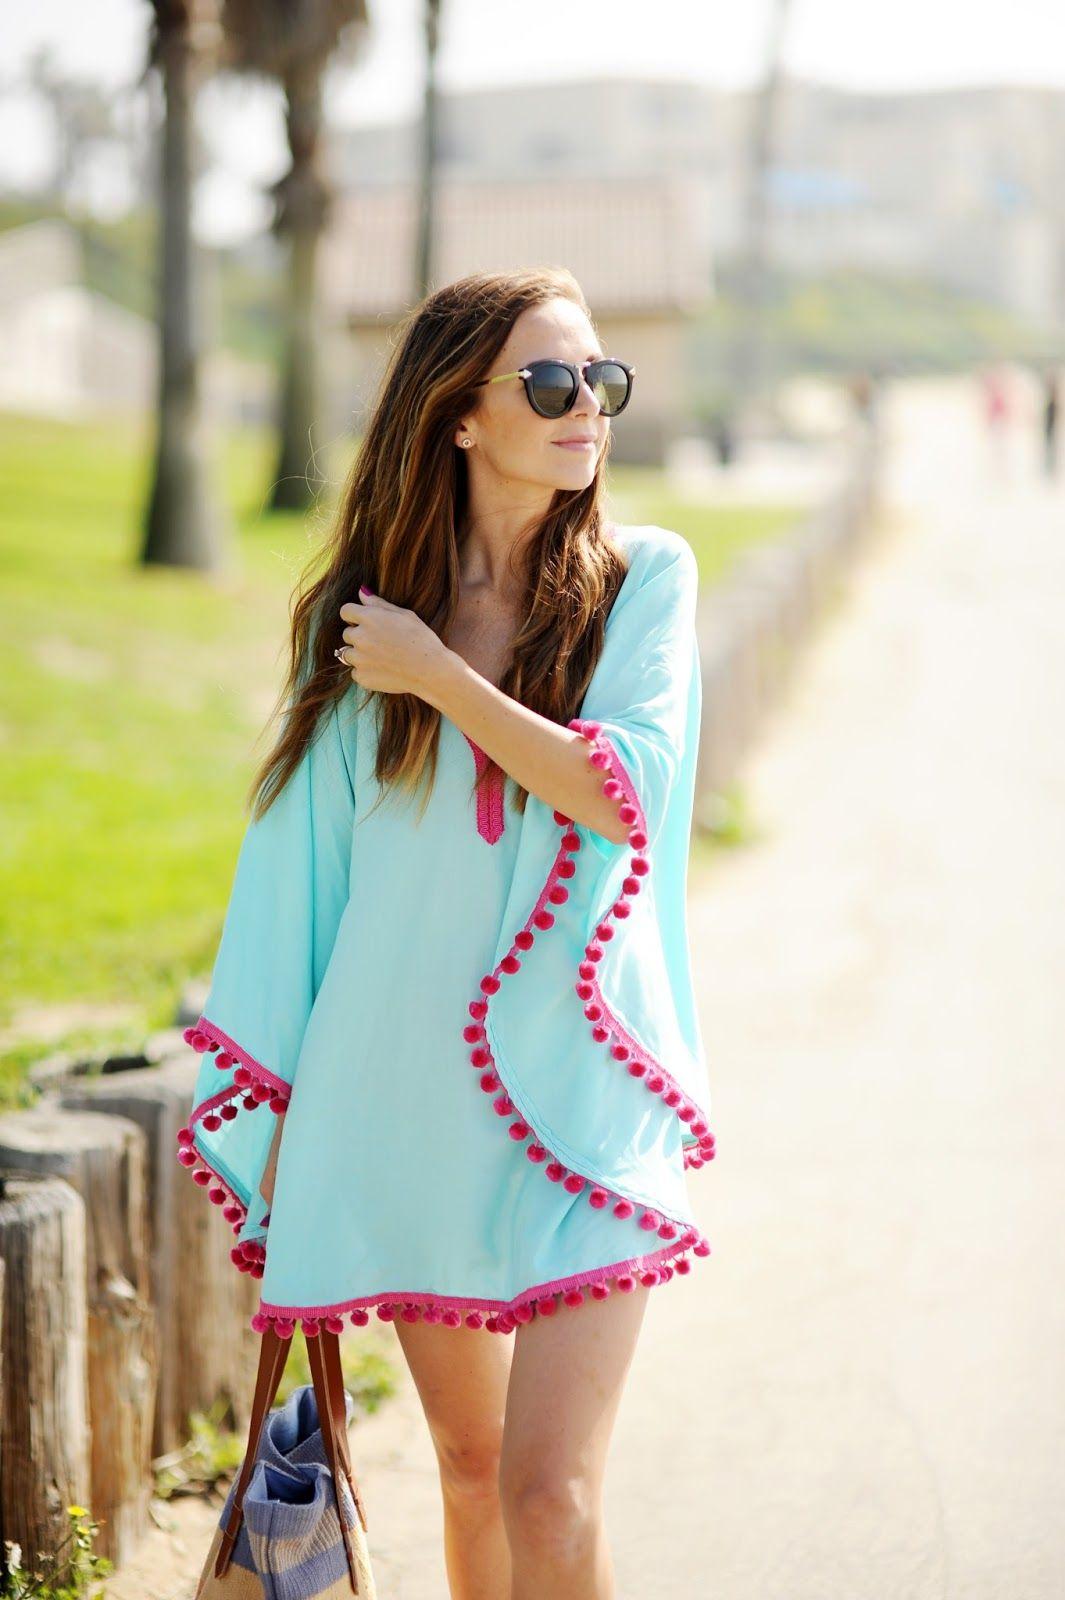 07e83b8f0ad80 Merrick's Art // Style + Sewing for the Everyday Girl: DIY FRIDAY: POM-POM  TRIM BEACH COVERUP